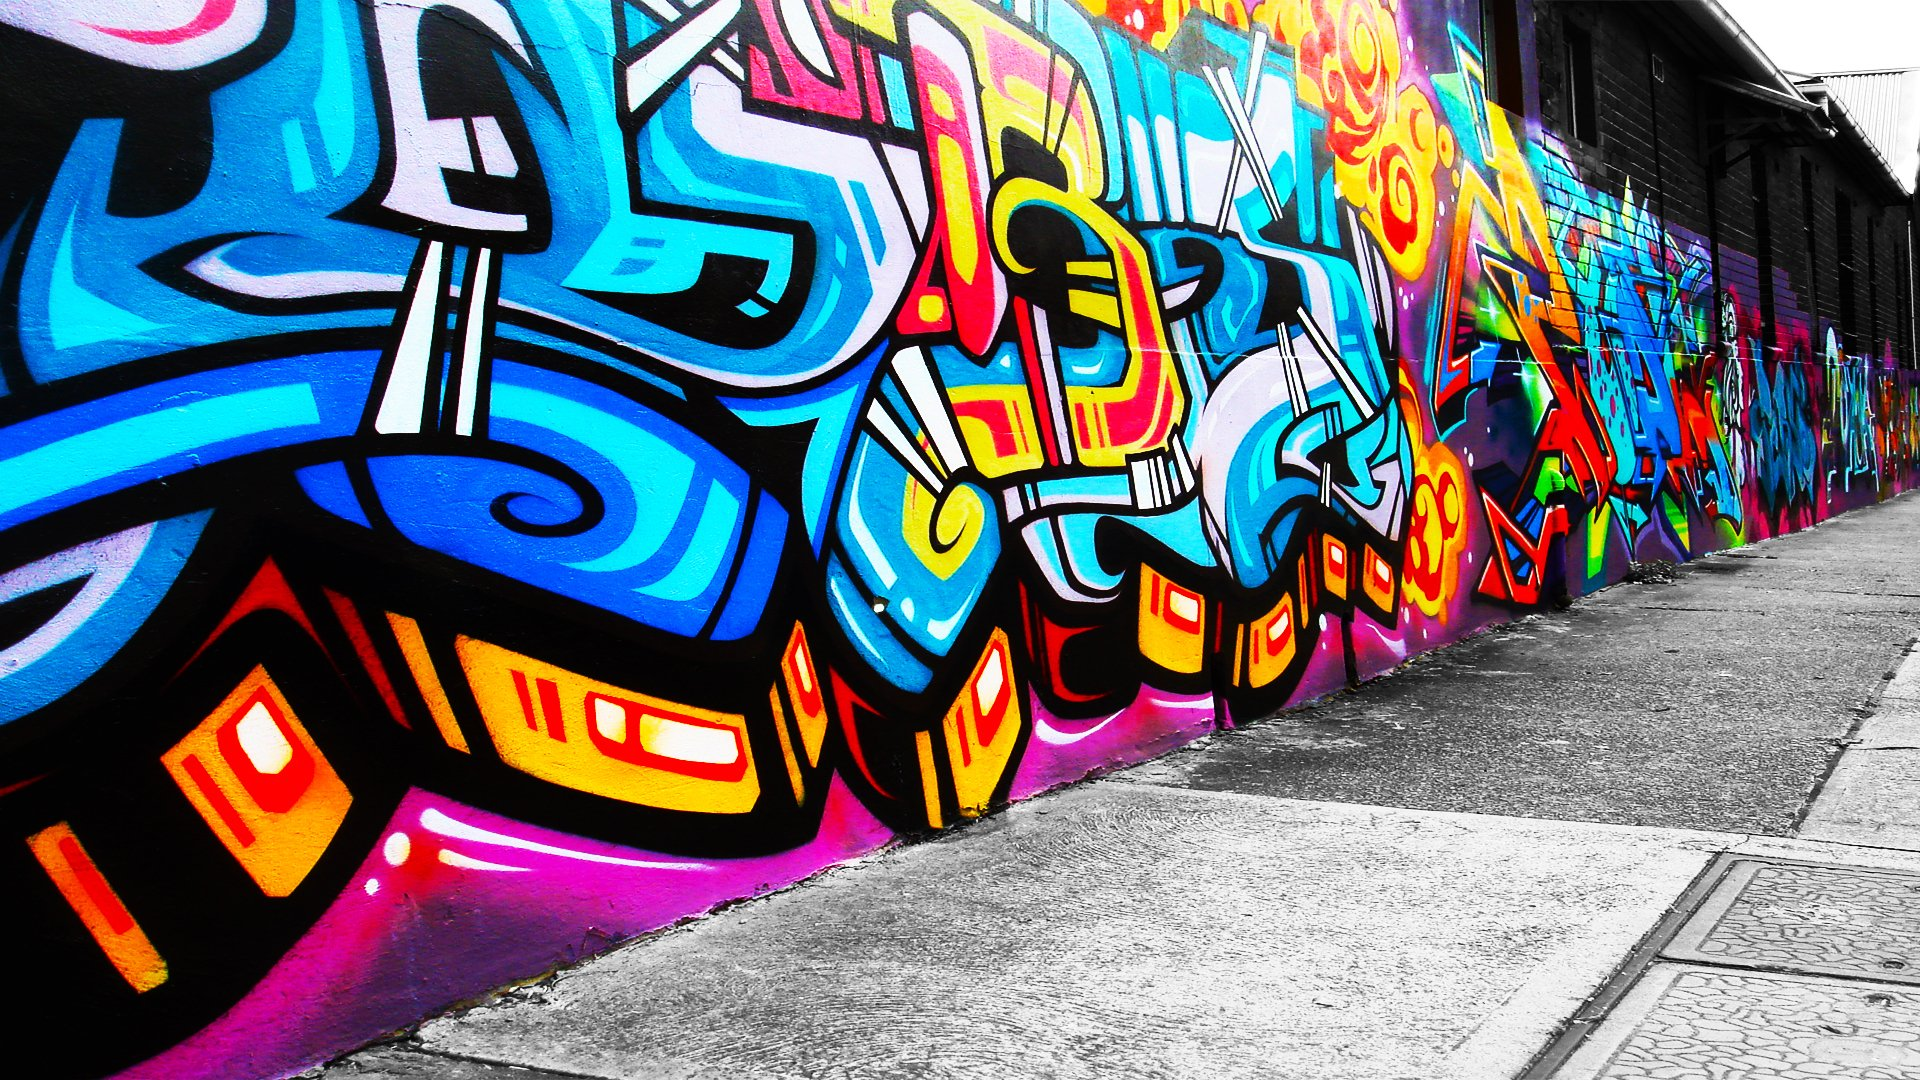 graffiti fondo de pantalla hd fondo de escritorio